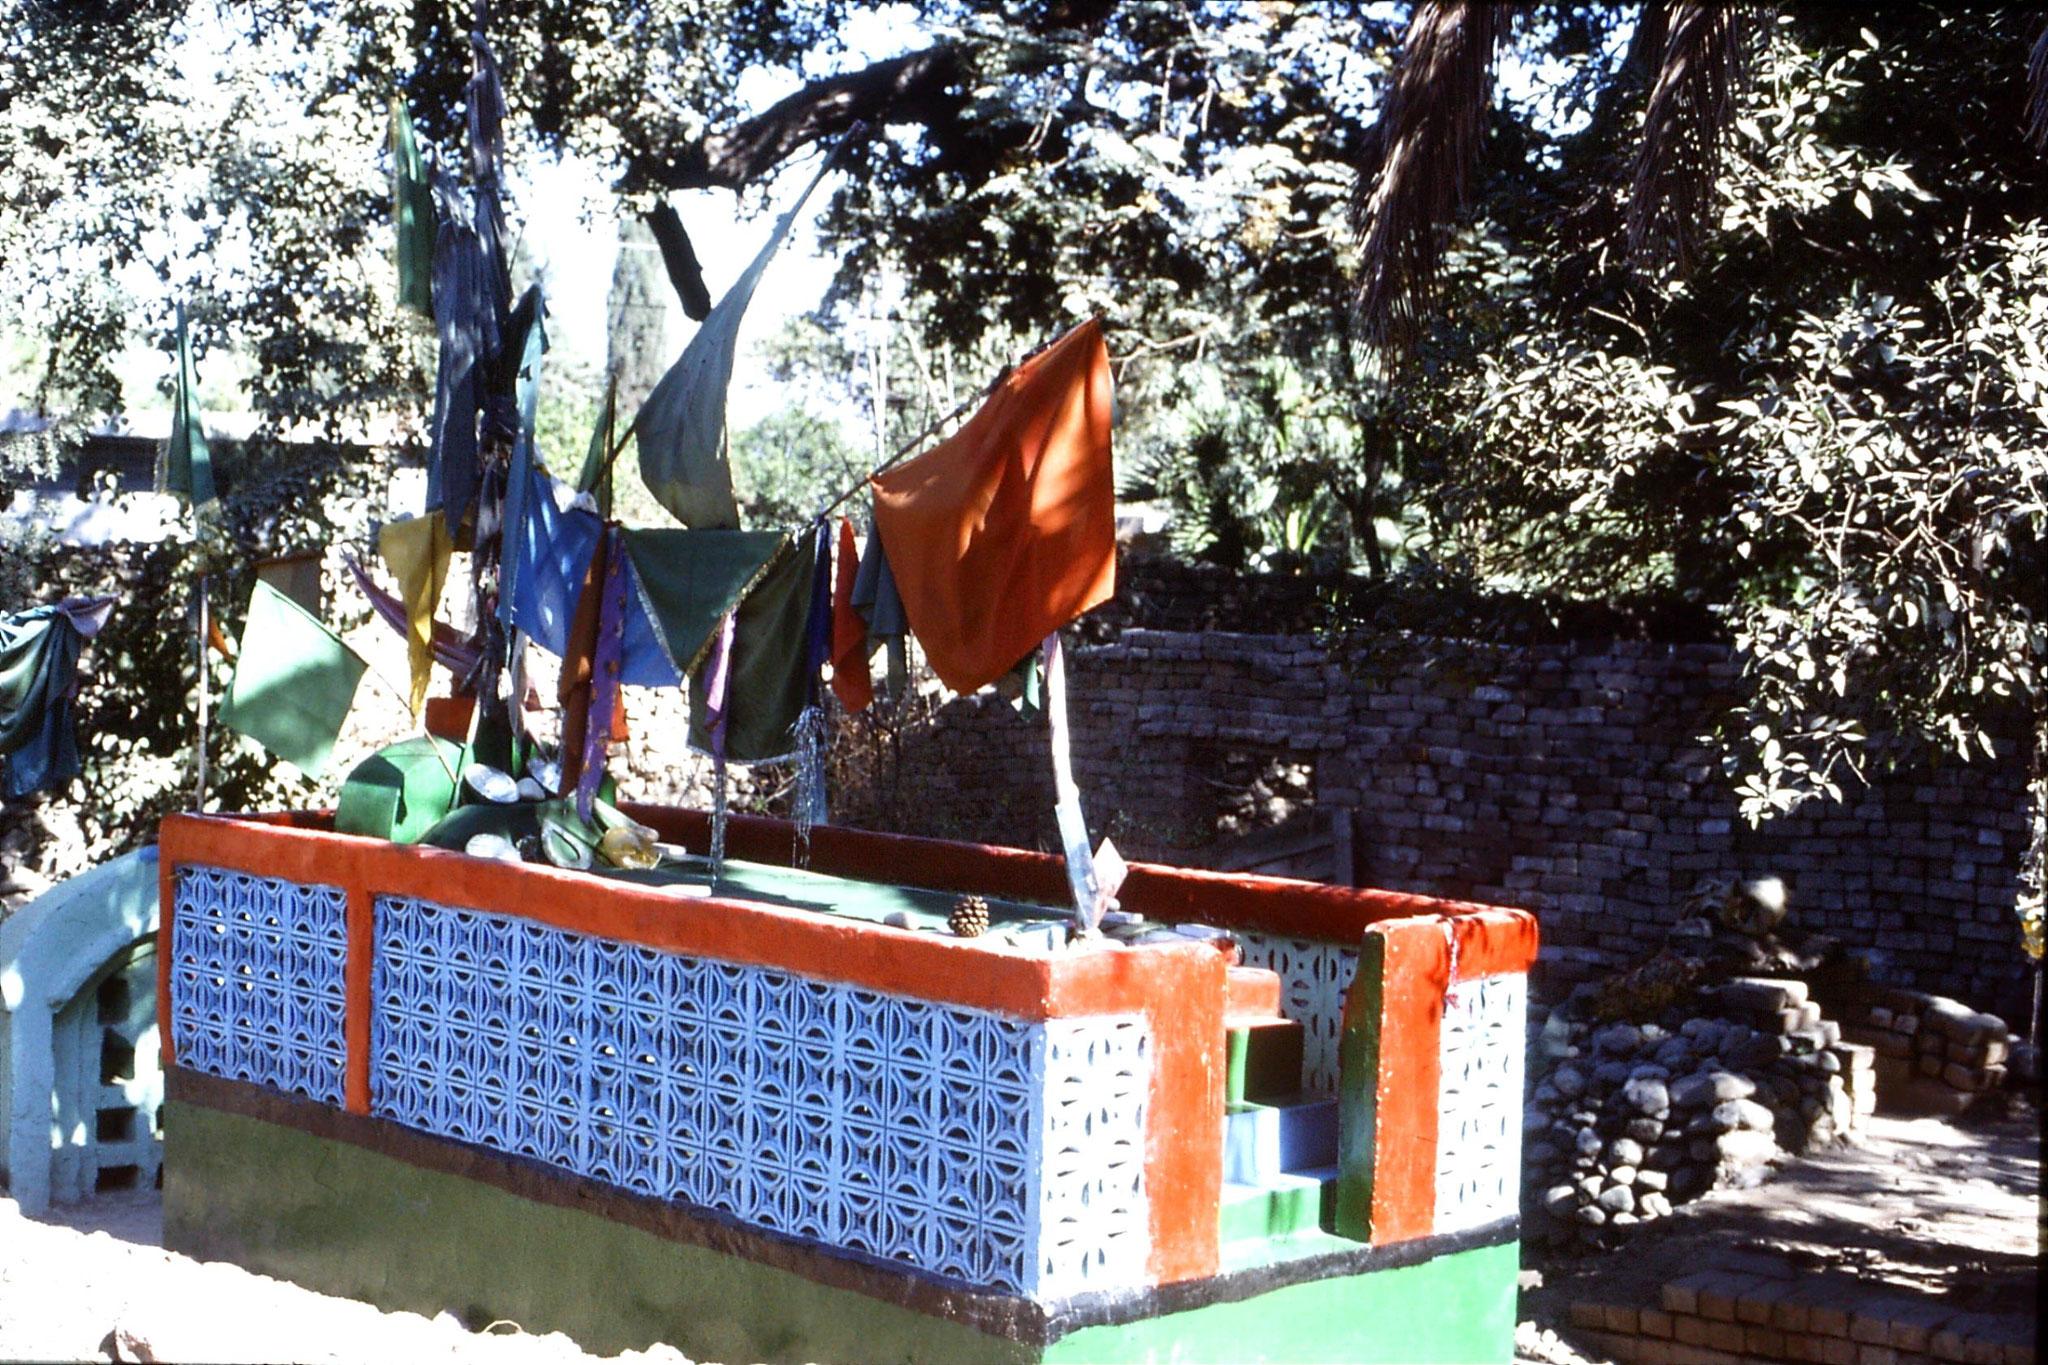 5/11/1989: 10: Peshawar, grave